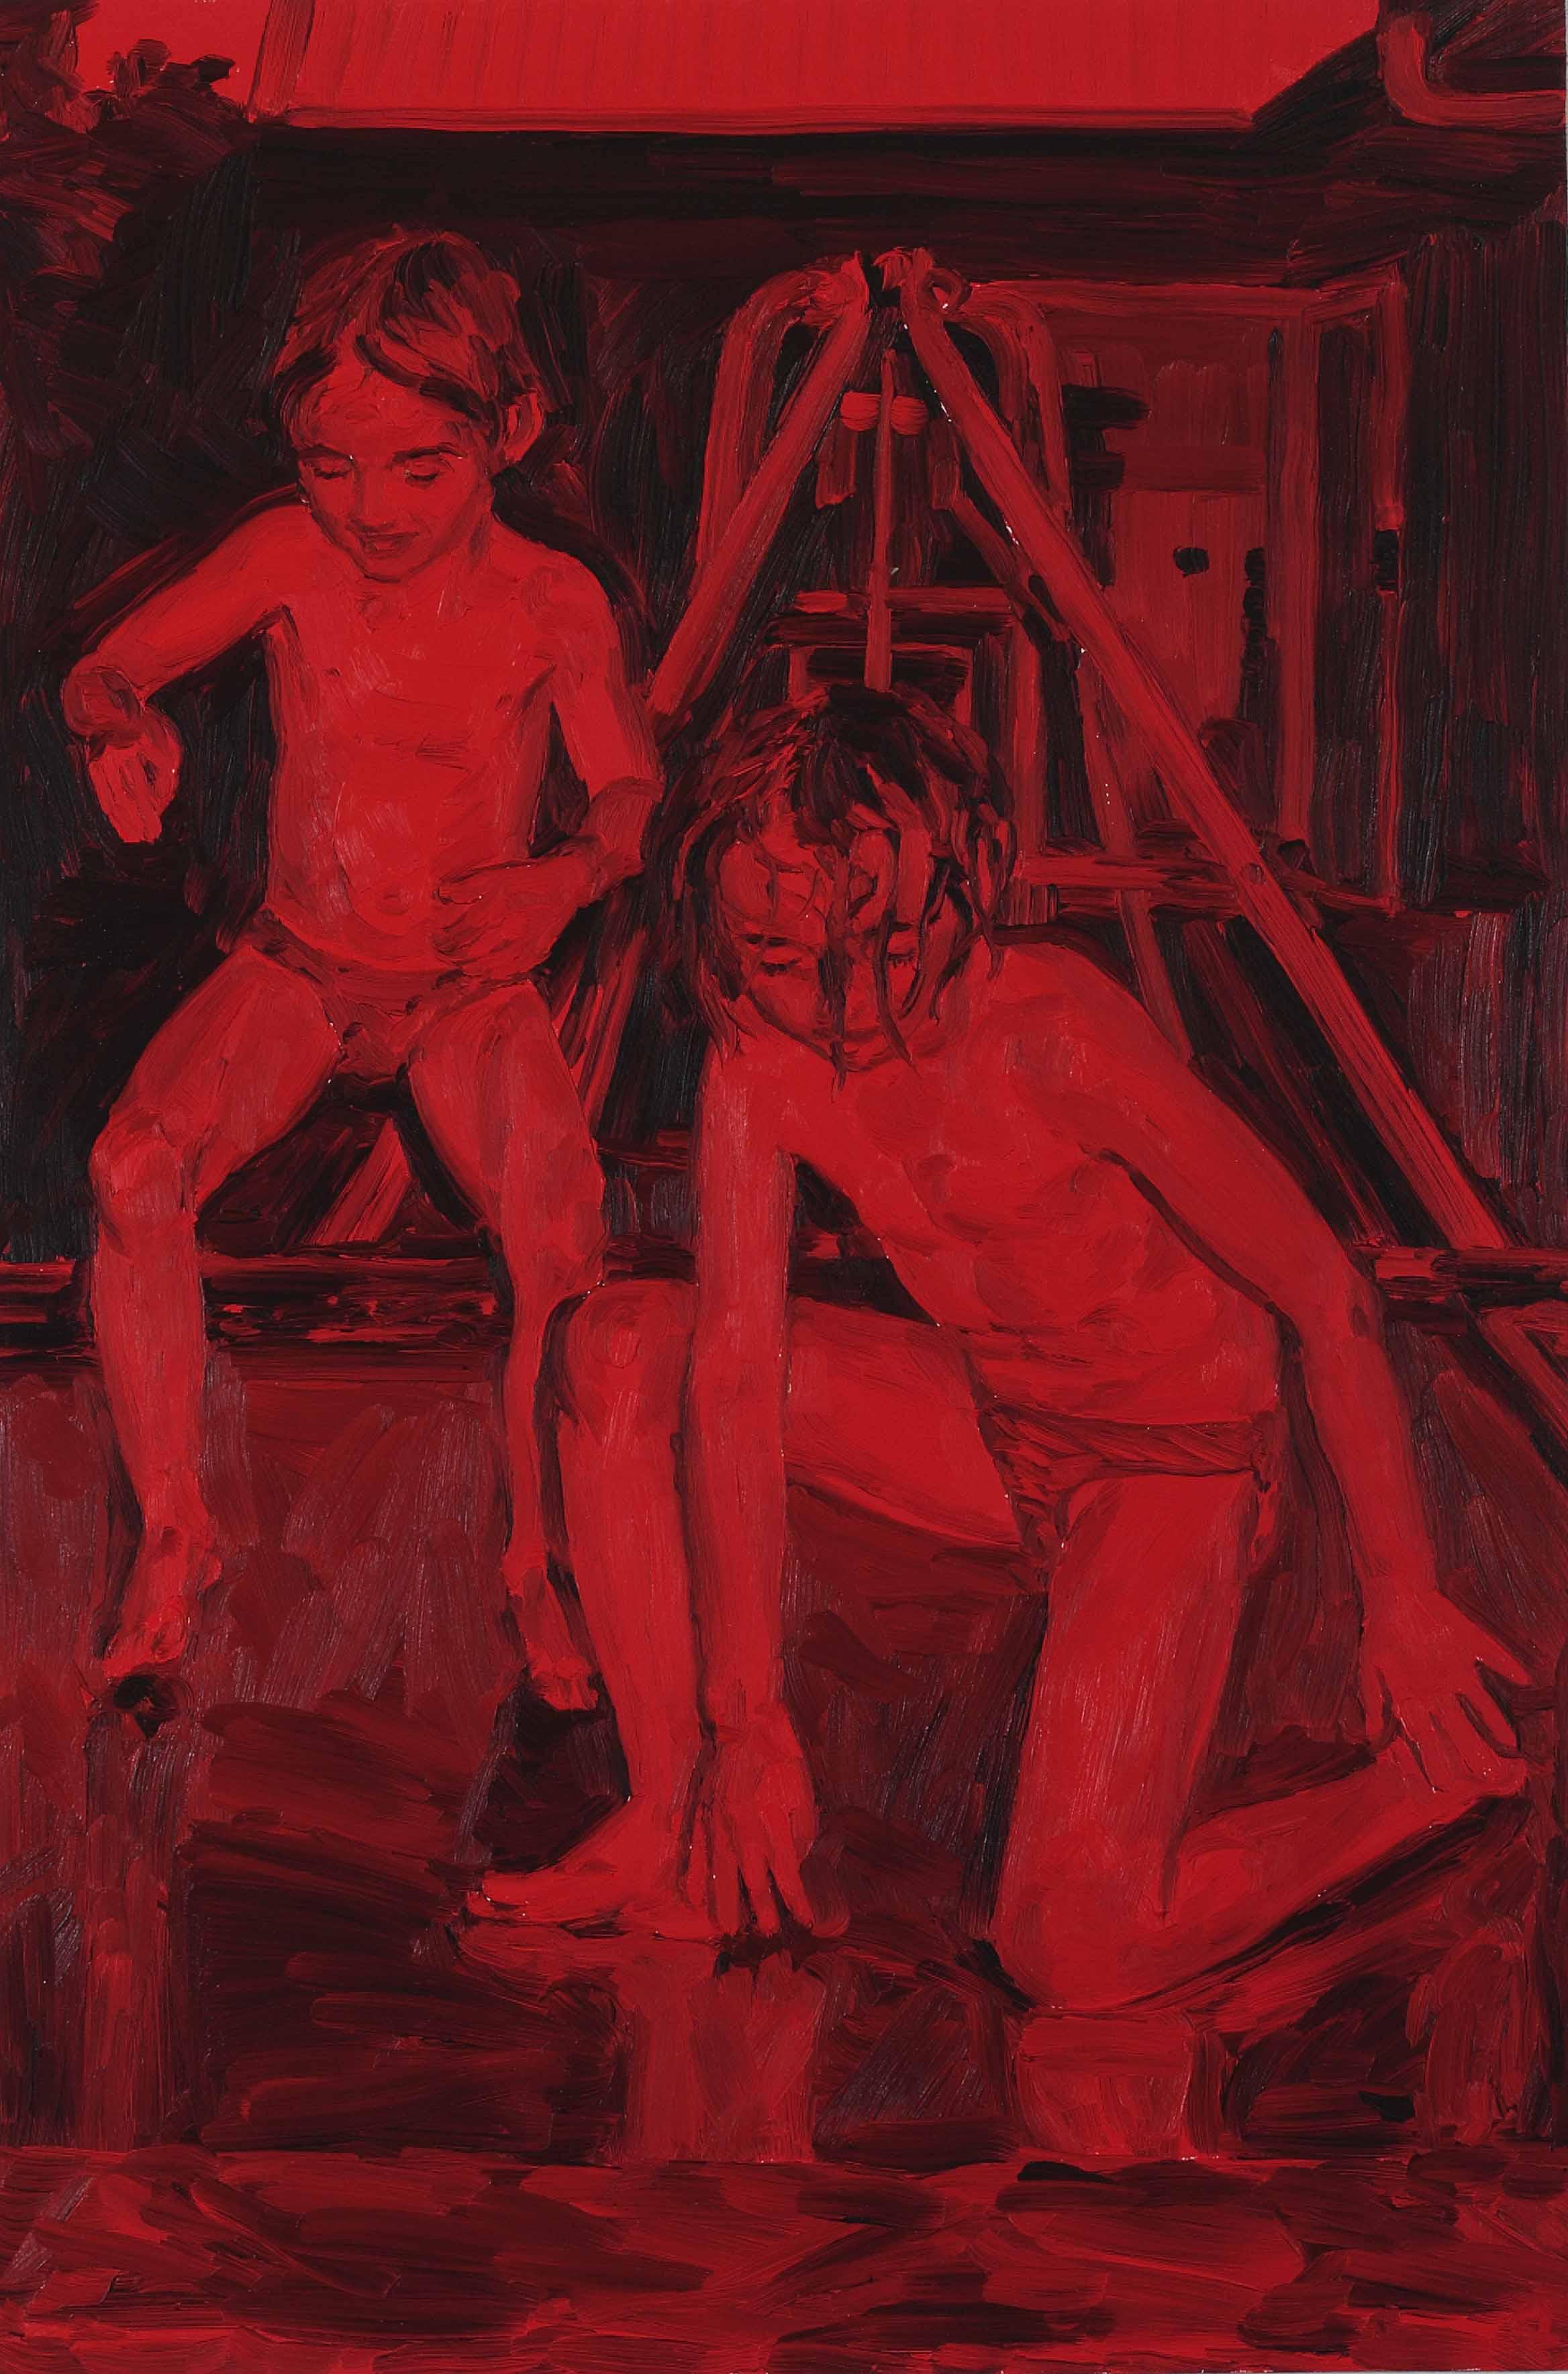 untitled, oil on board, 60 x 40 cm, 2008.